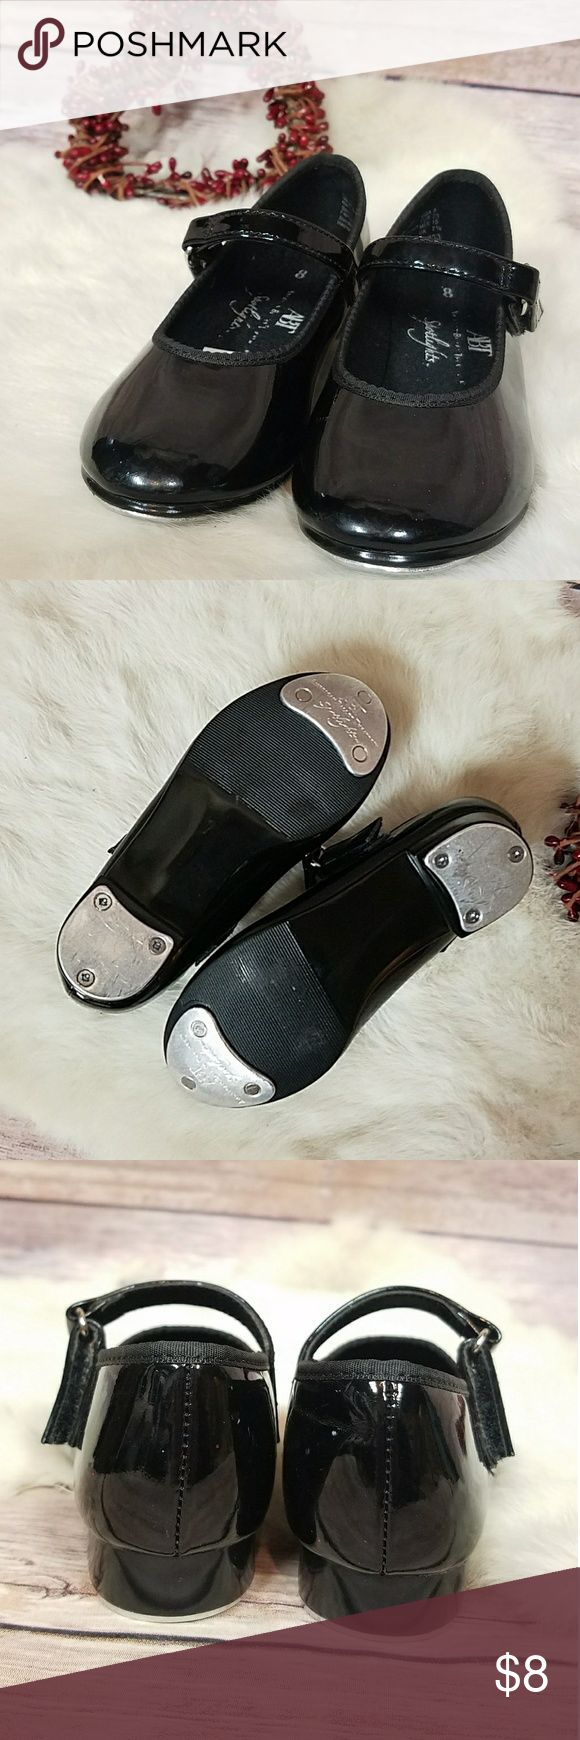 🌹Girl's ABT Spotlights Patent Tap Shoe sz 8 Velcro closure, gently worn. ABT Costumes Dance